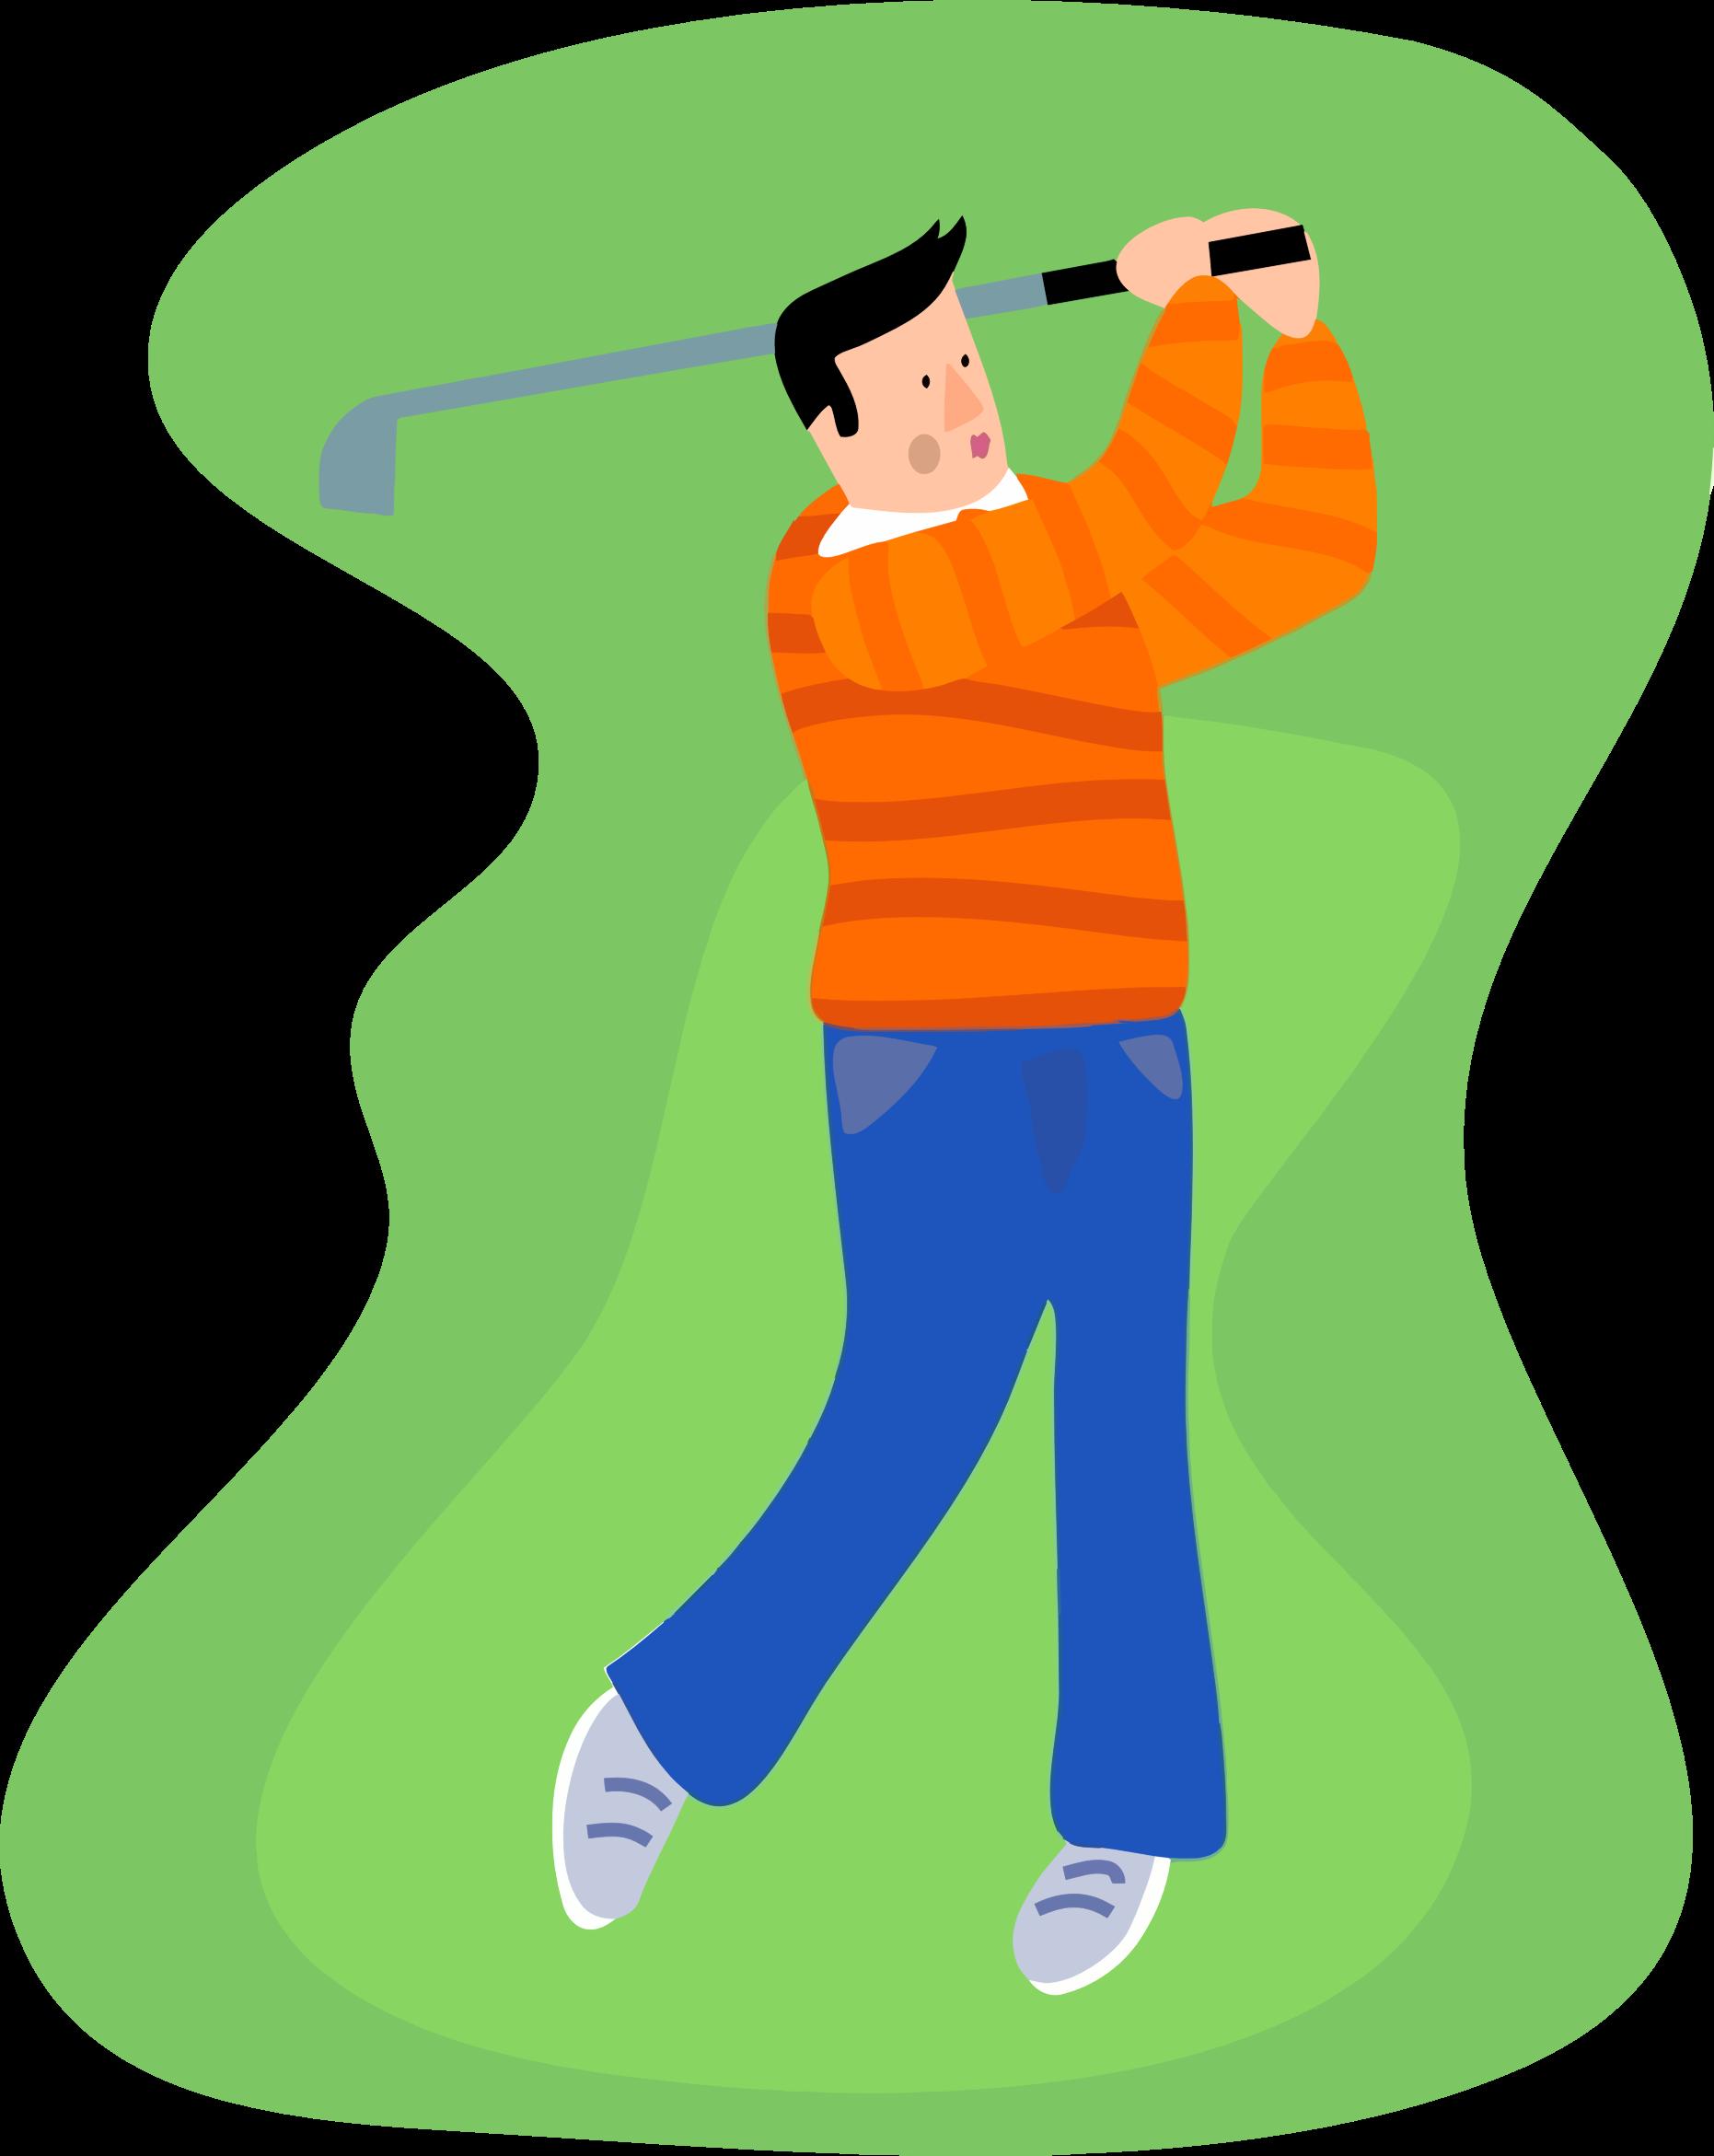 Golf clipart cartoon, Golf cartoon Transparent FREE for ...